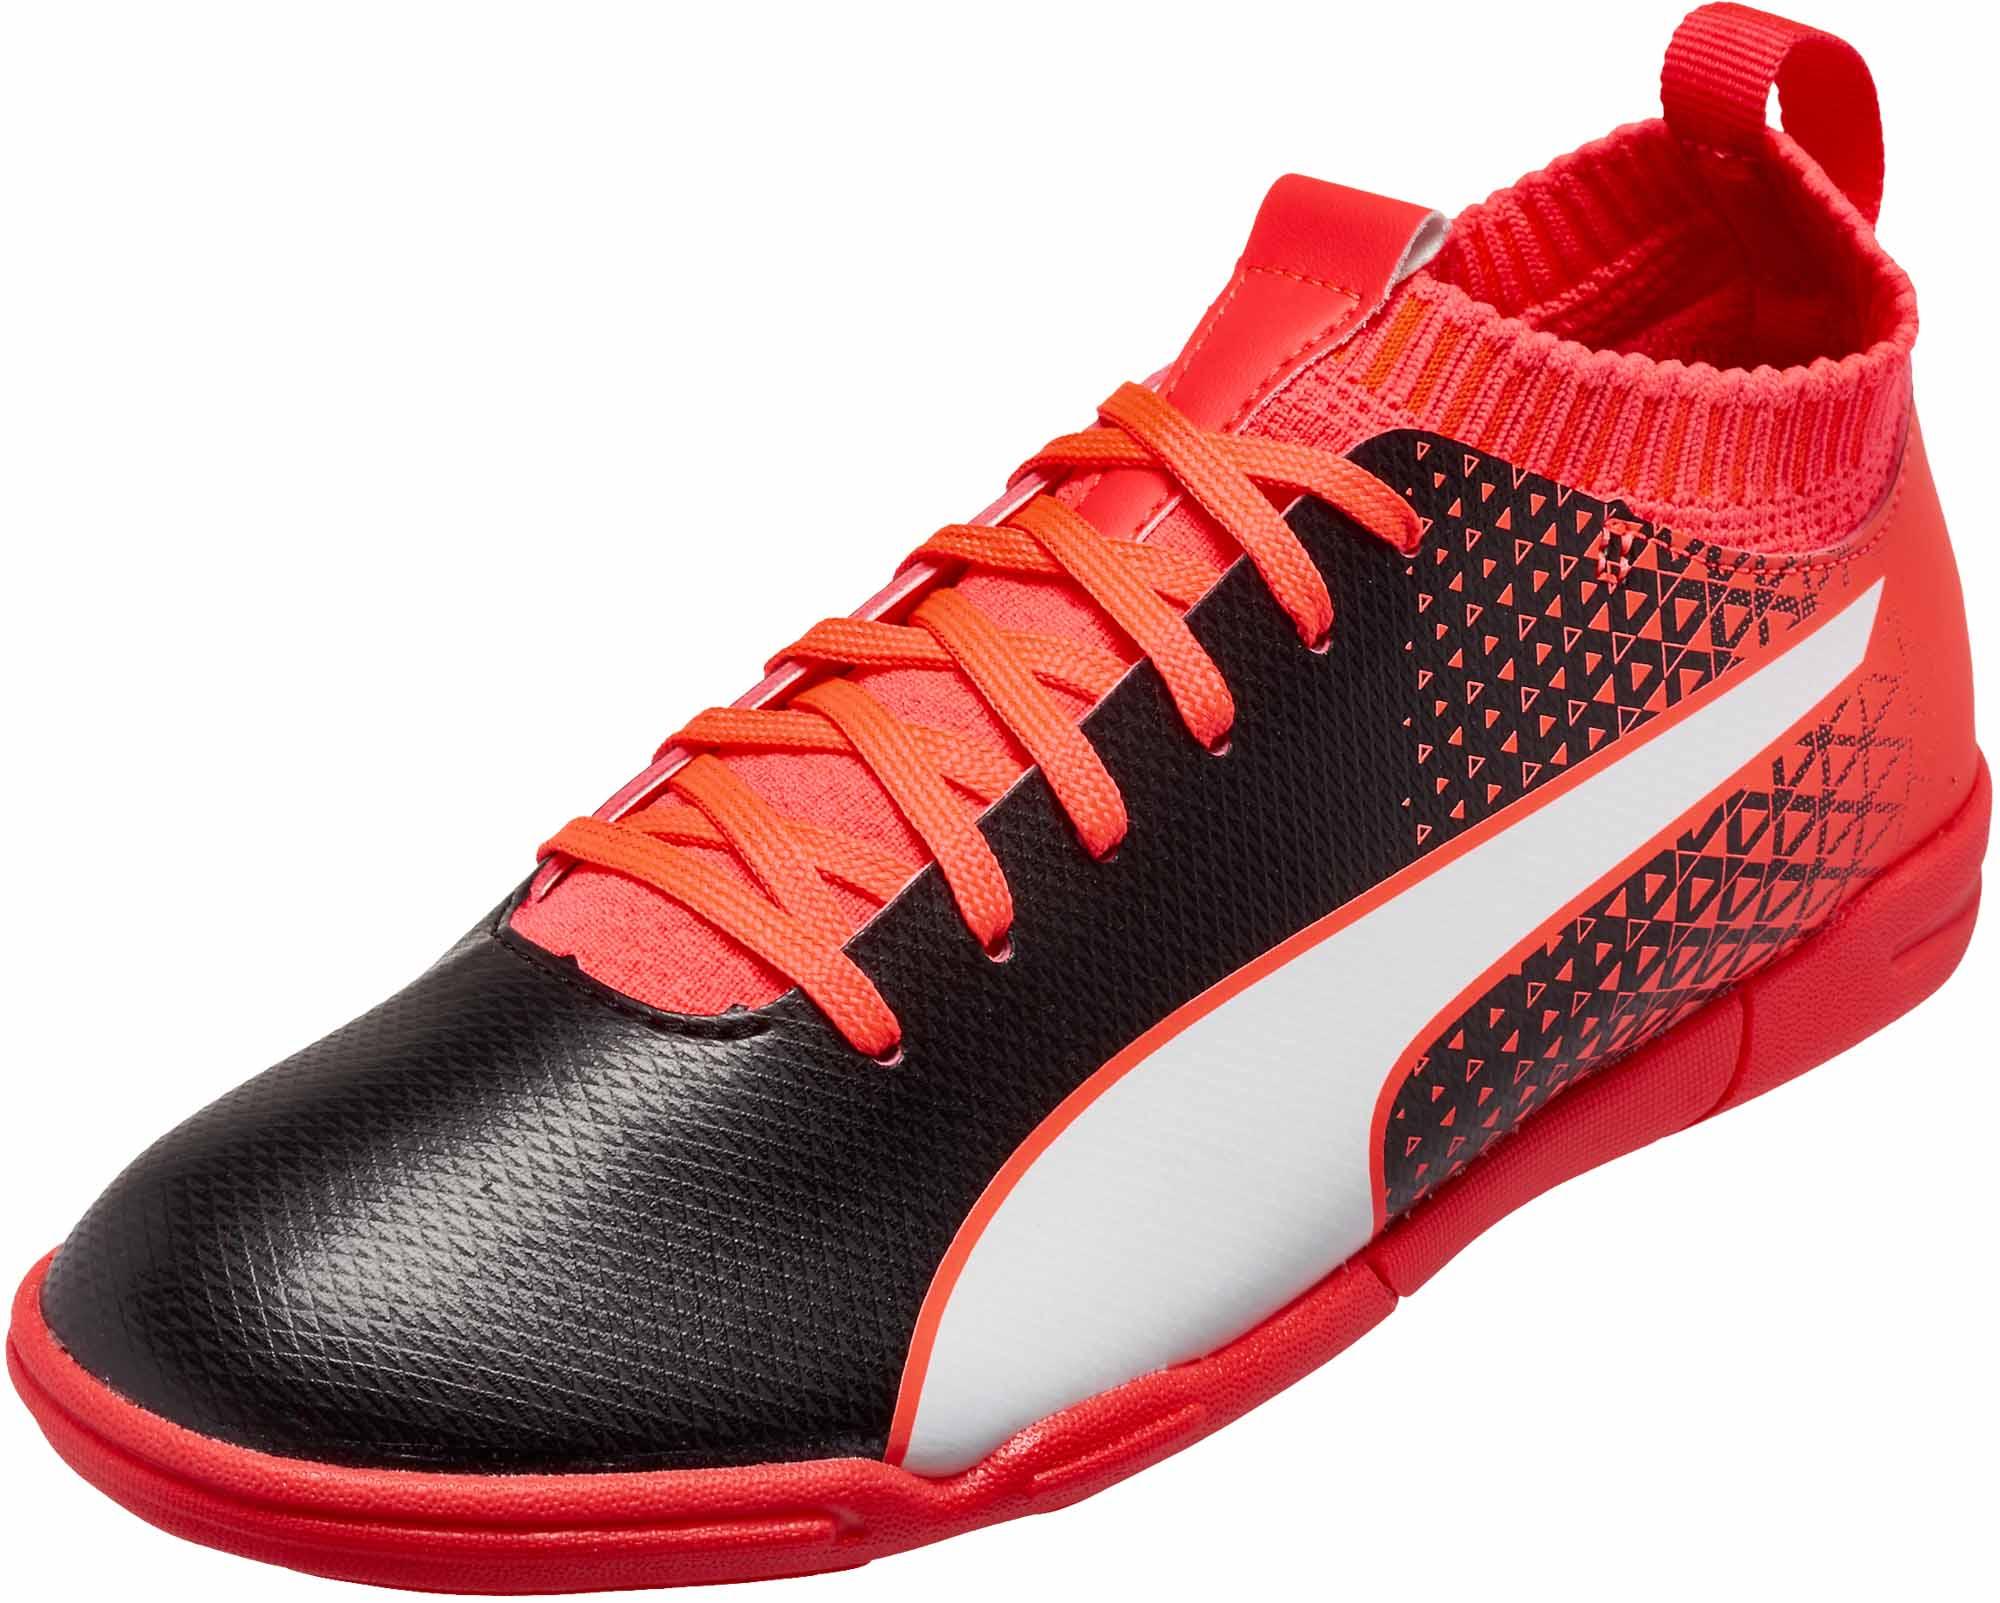 afaa3a242b2 Puma Kids evoKNIT FTB IT Shoes - Puma Soccer Shoes